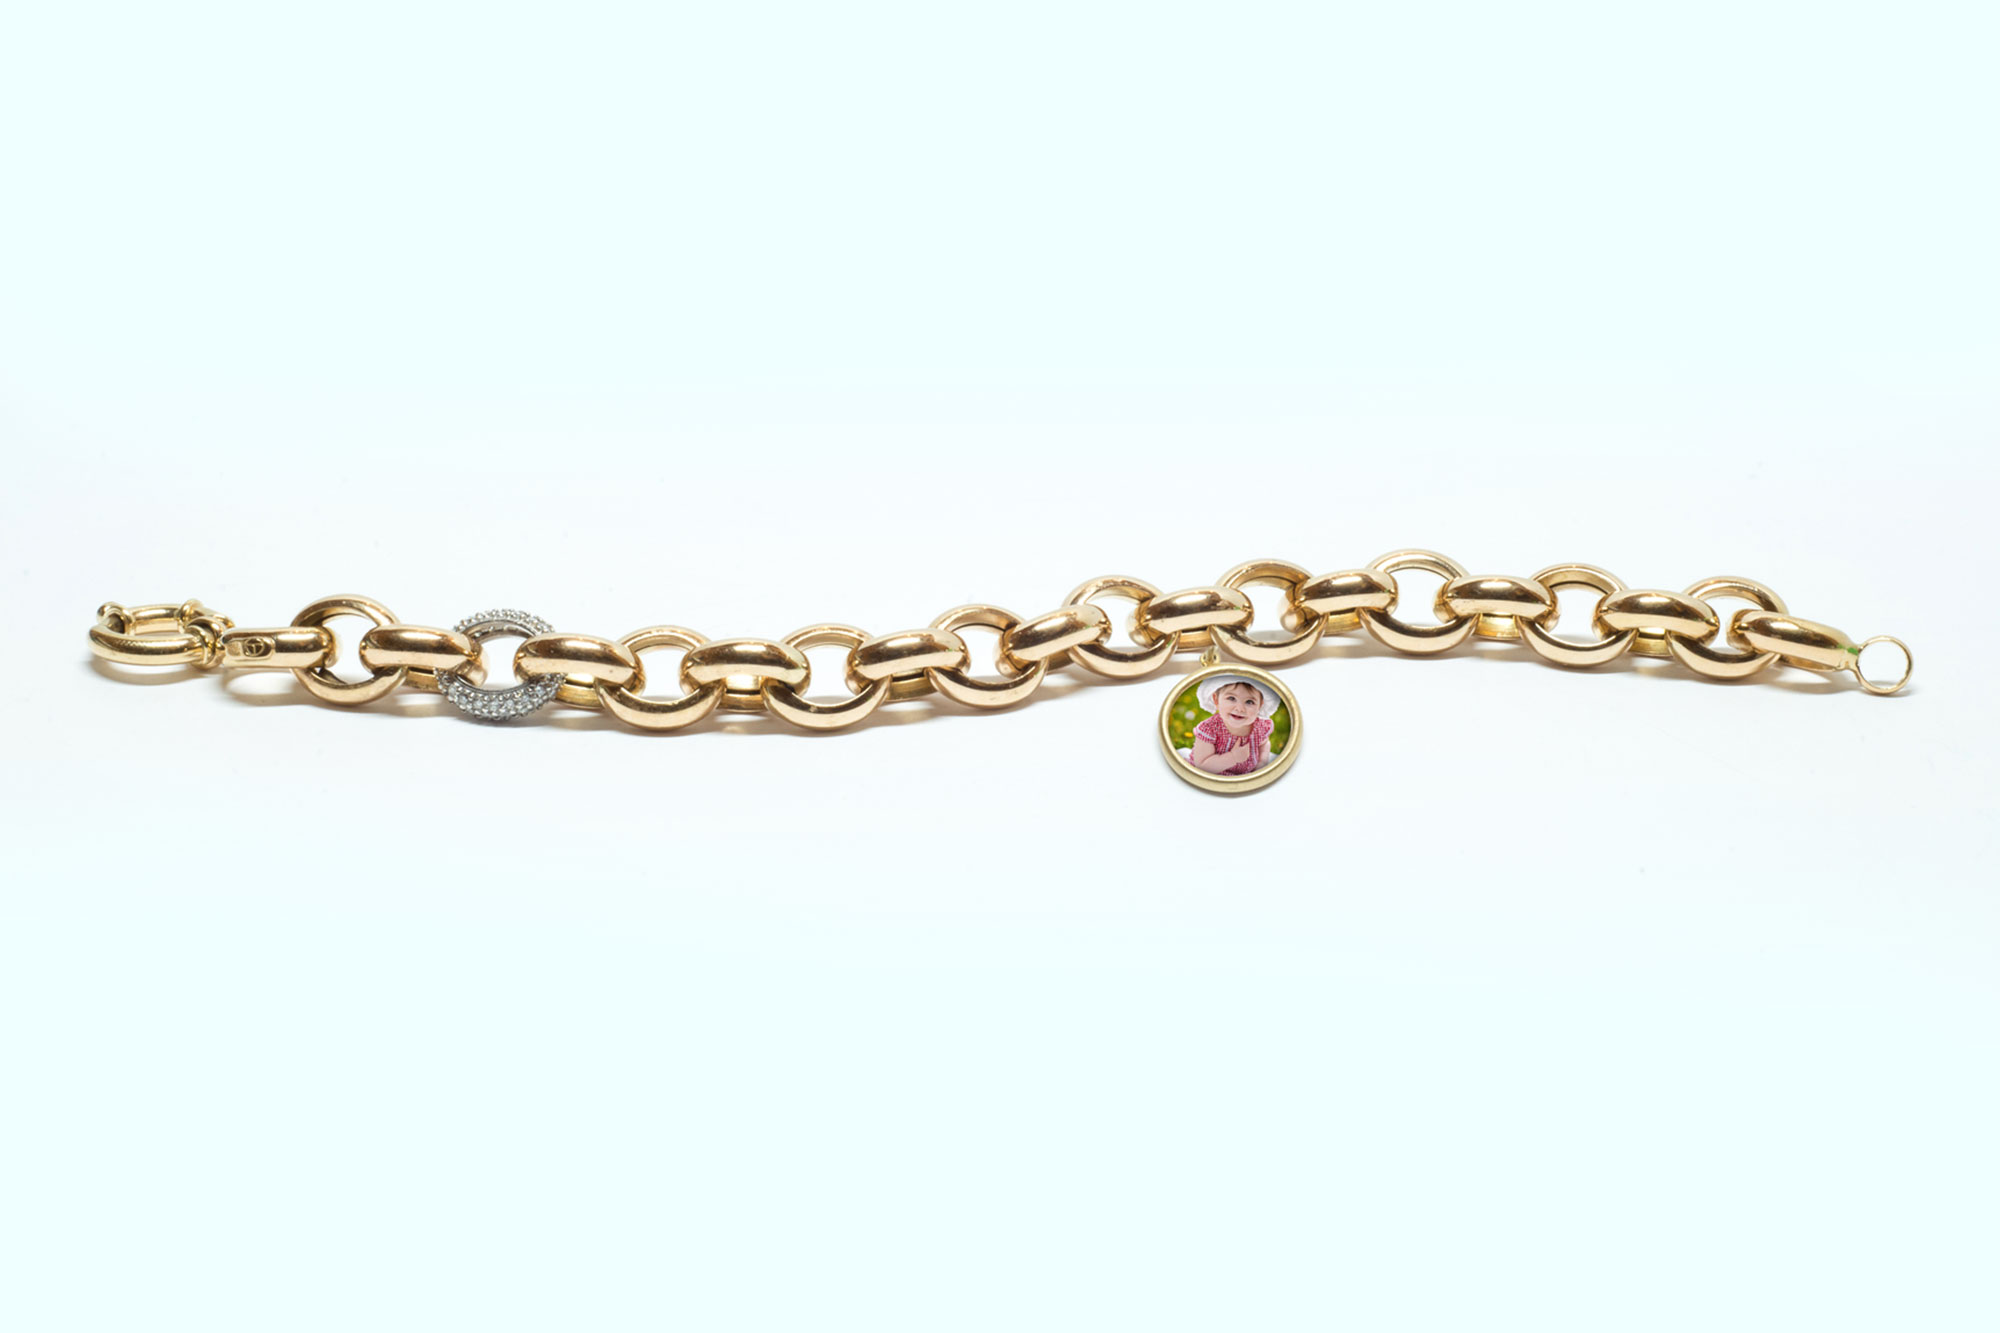 Presenting the Hillary Bracelet